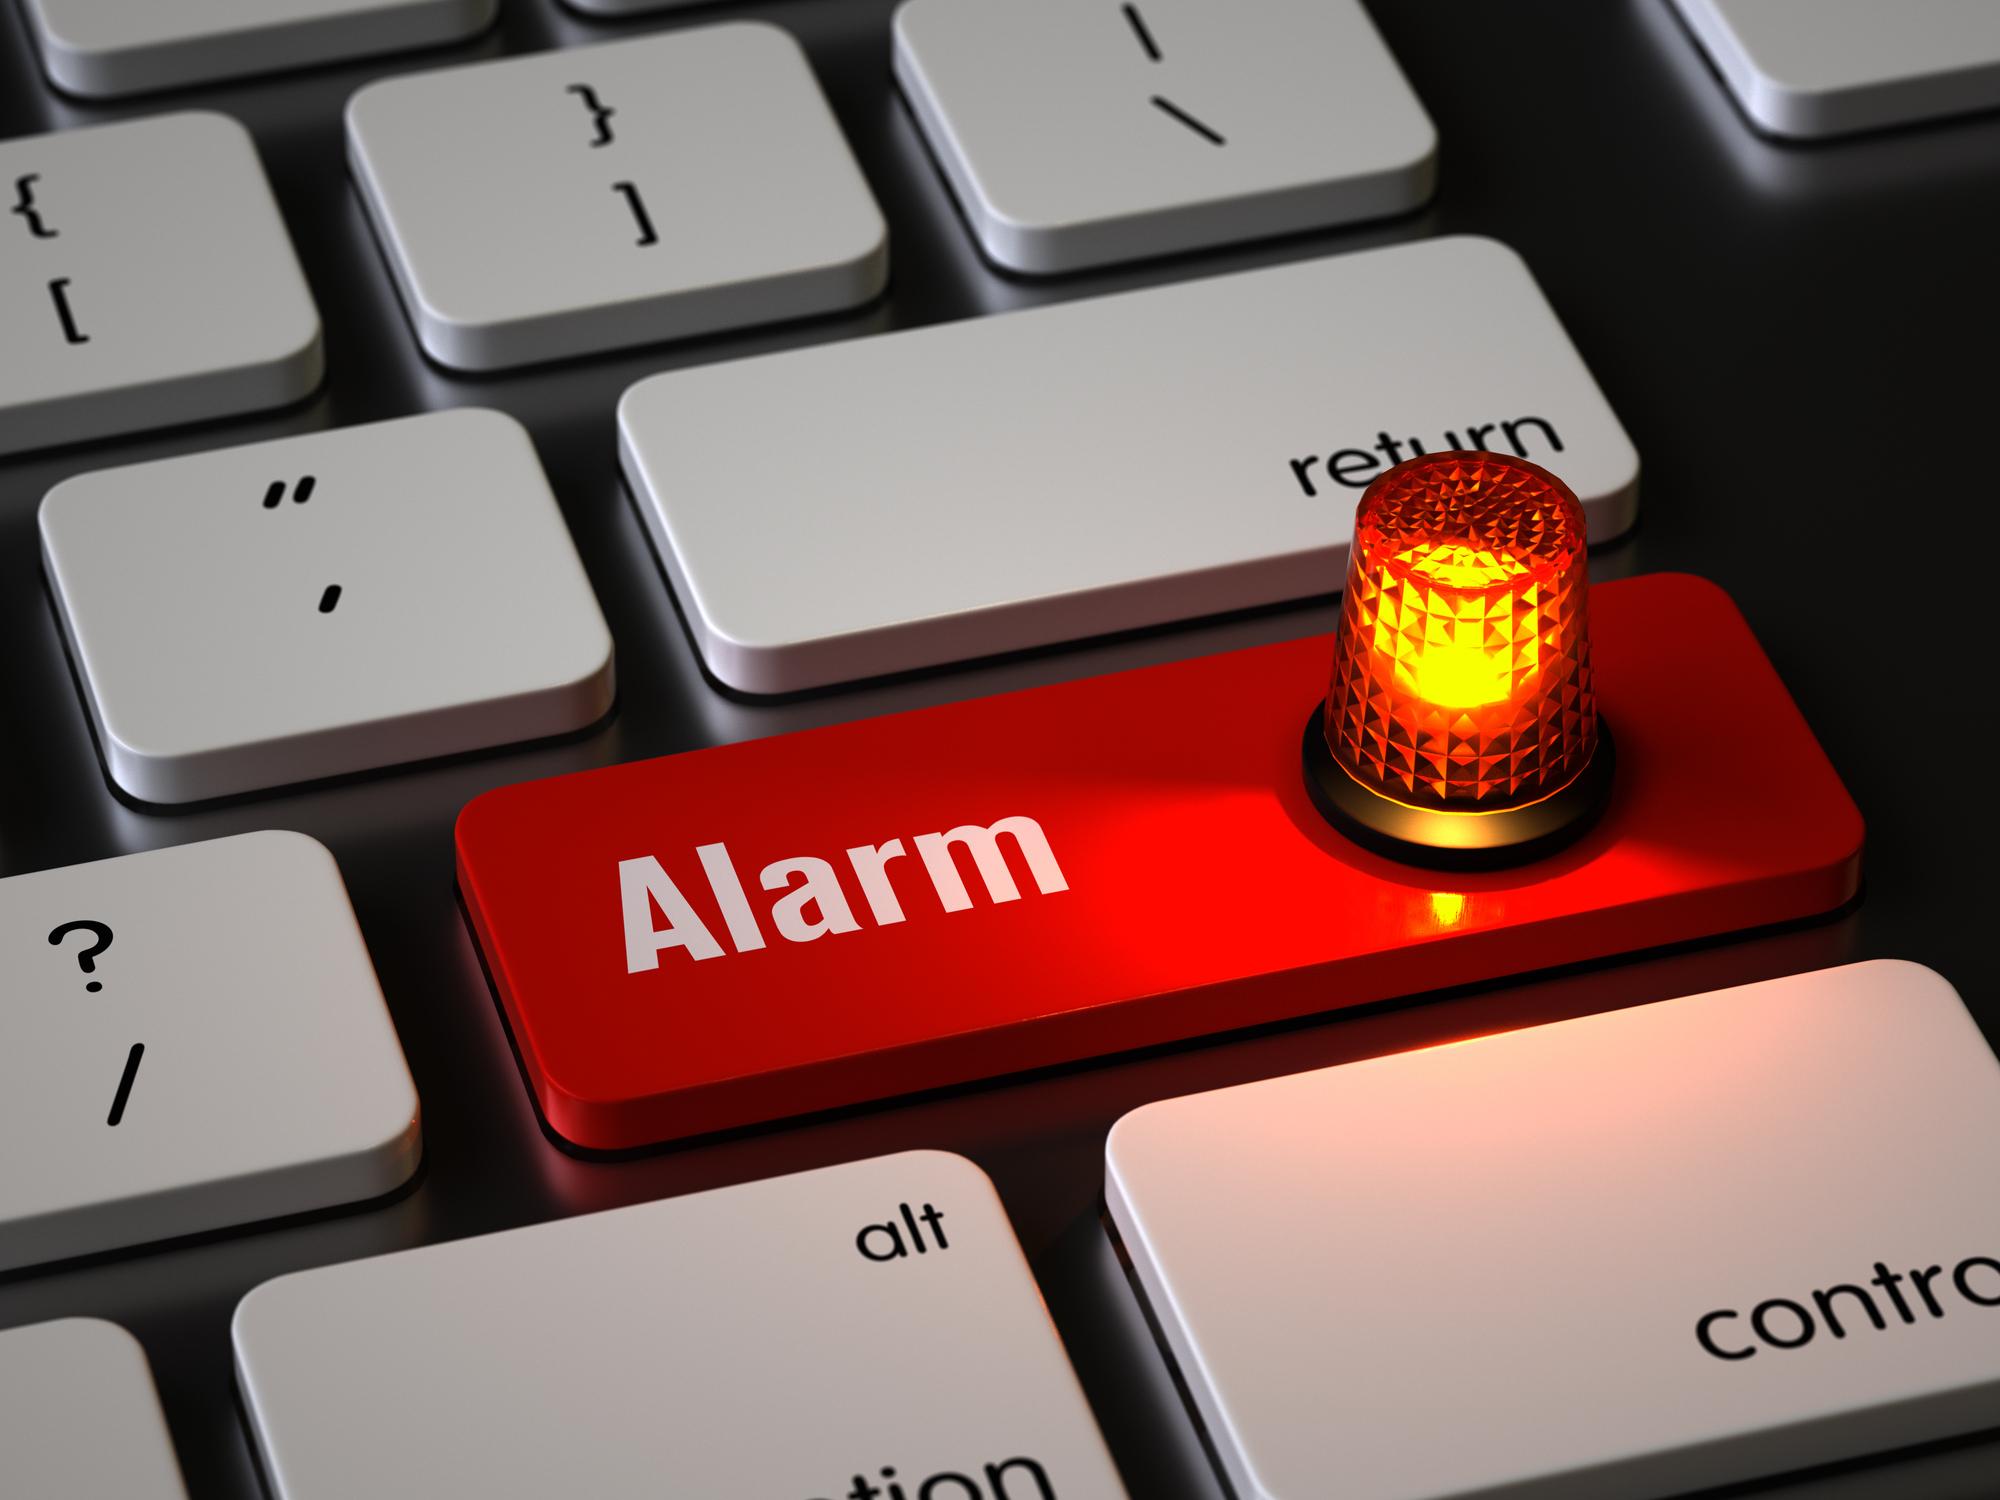 Alarm button on keyboard